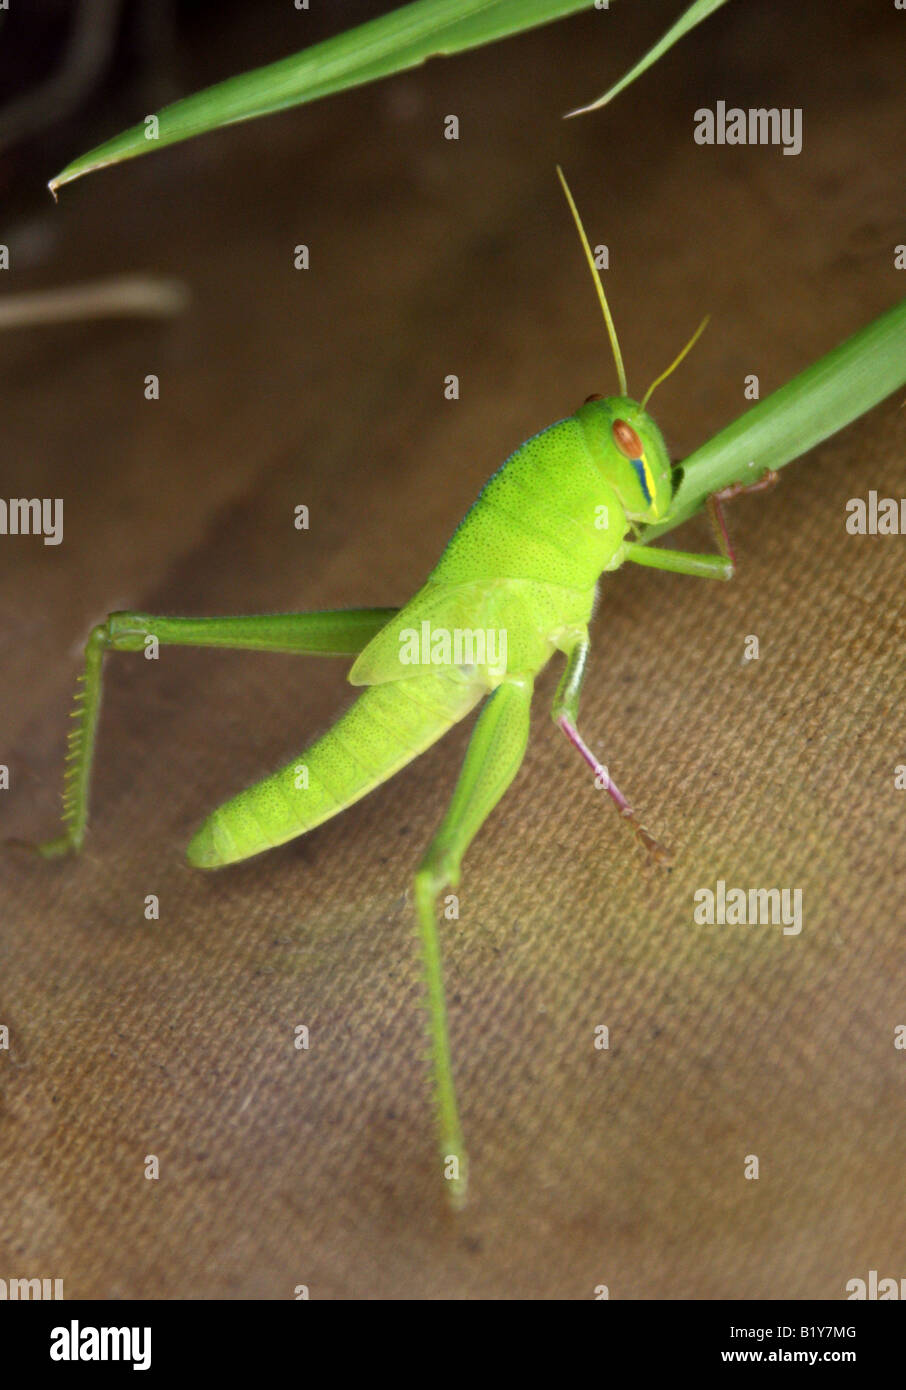 Vagrant Grasshopper or Gray Bird Grasshopper Nymph Stage Schistocerca nitens Stock Photo